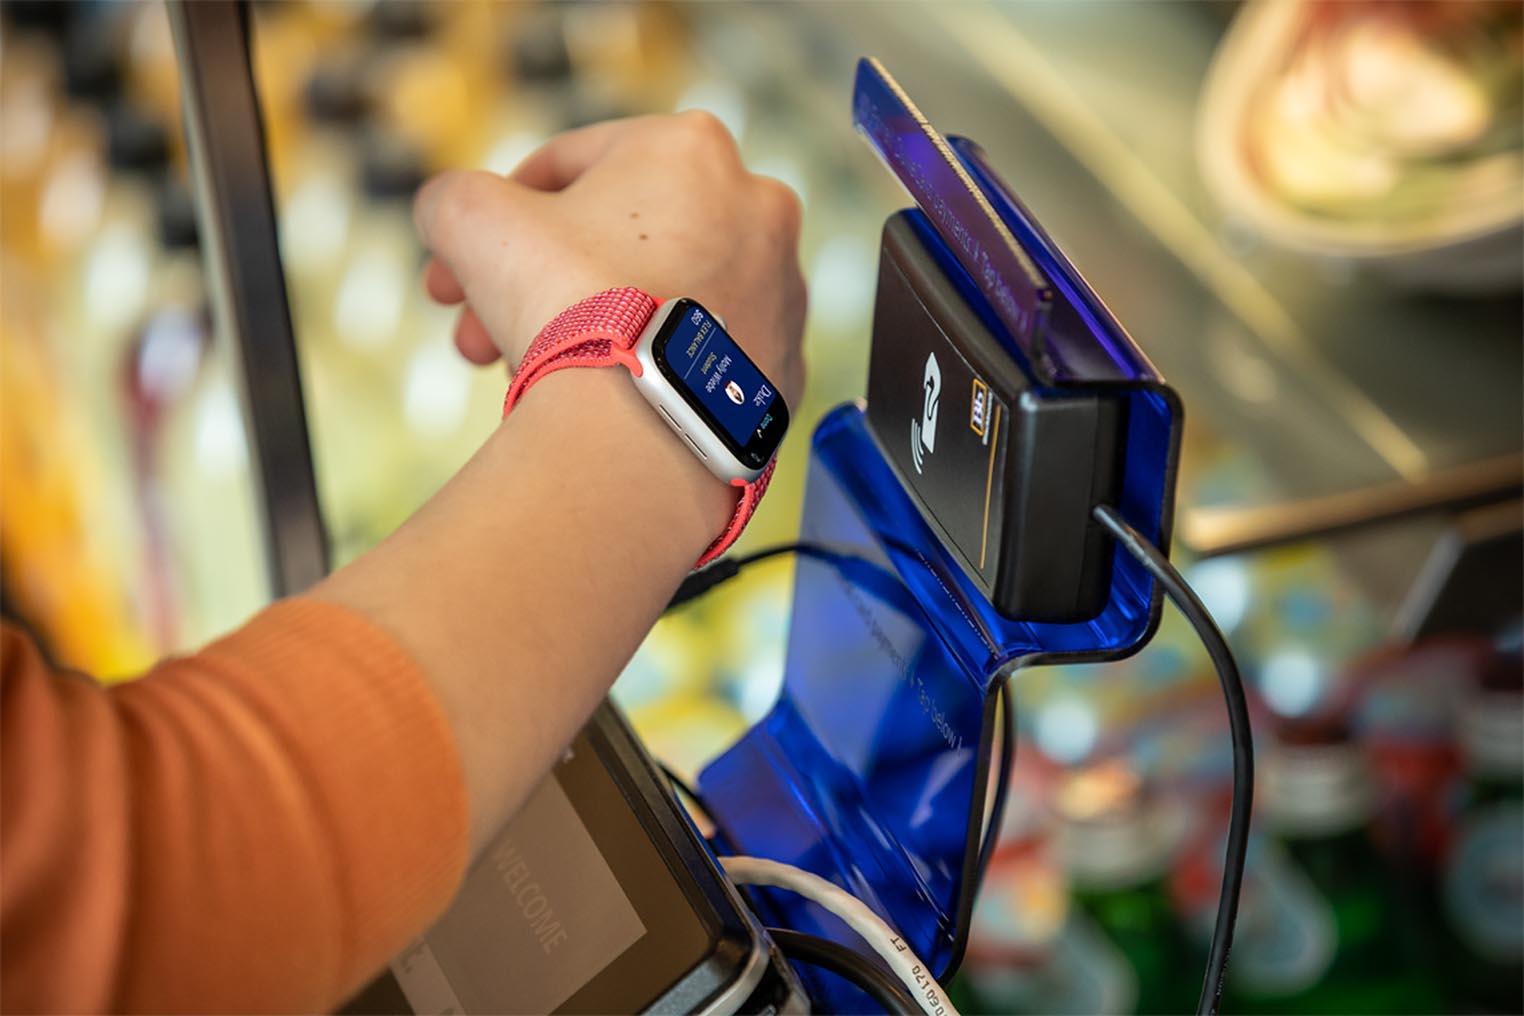 Apple Watch Wallet étudiants